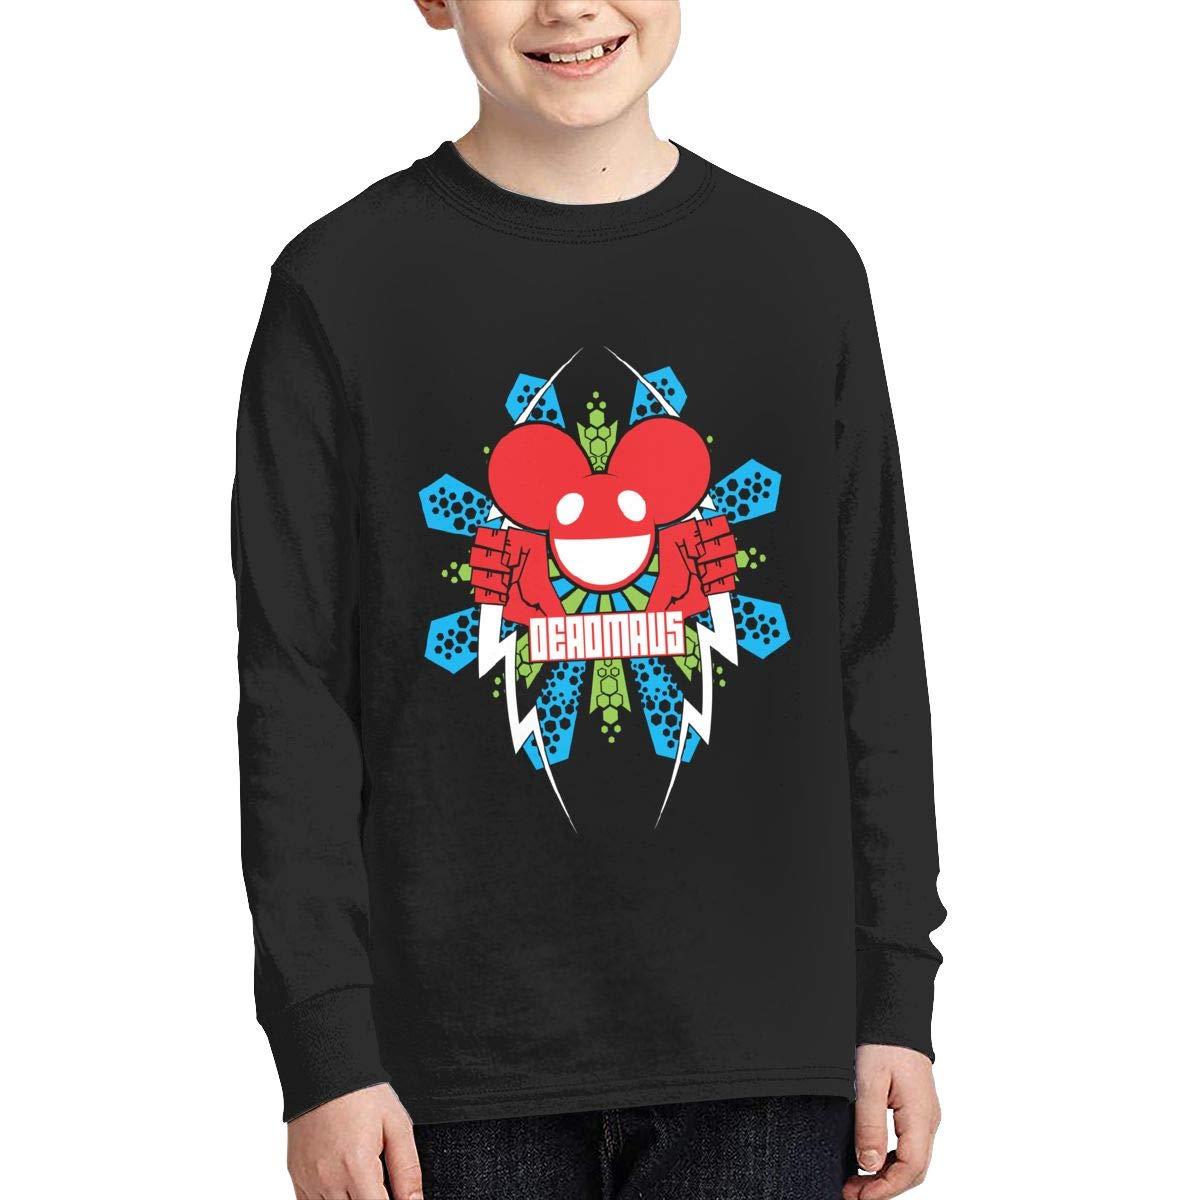 RyanCSchmitt Deadmau5 Youth Boys Girls Funny Long Sleeves T Shirt Fashion Youth Tee Shirts